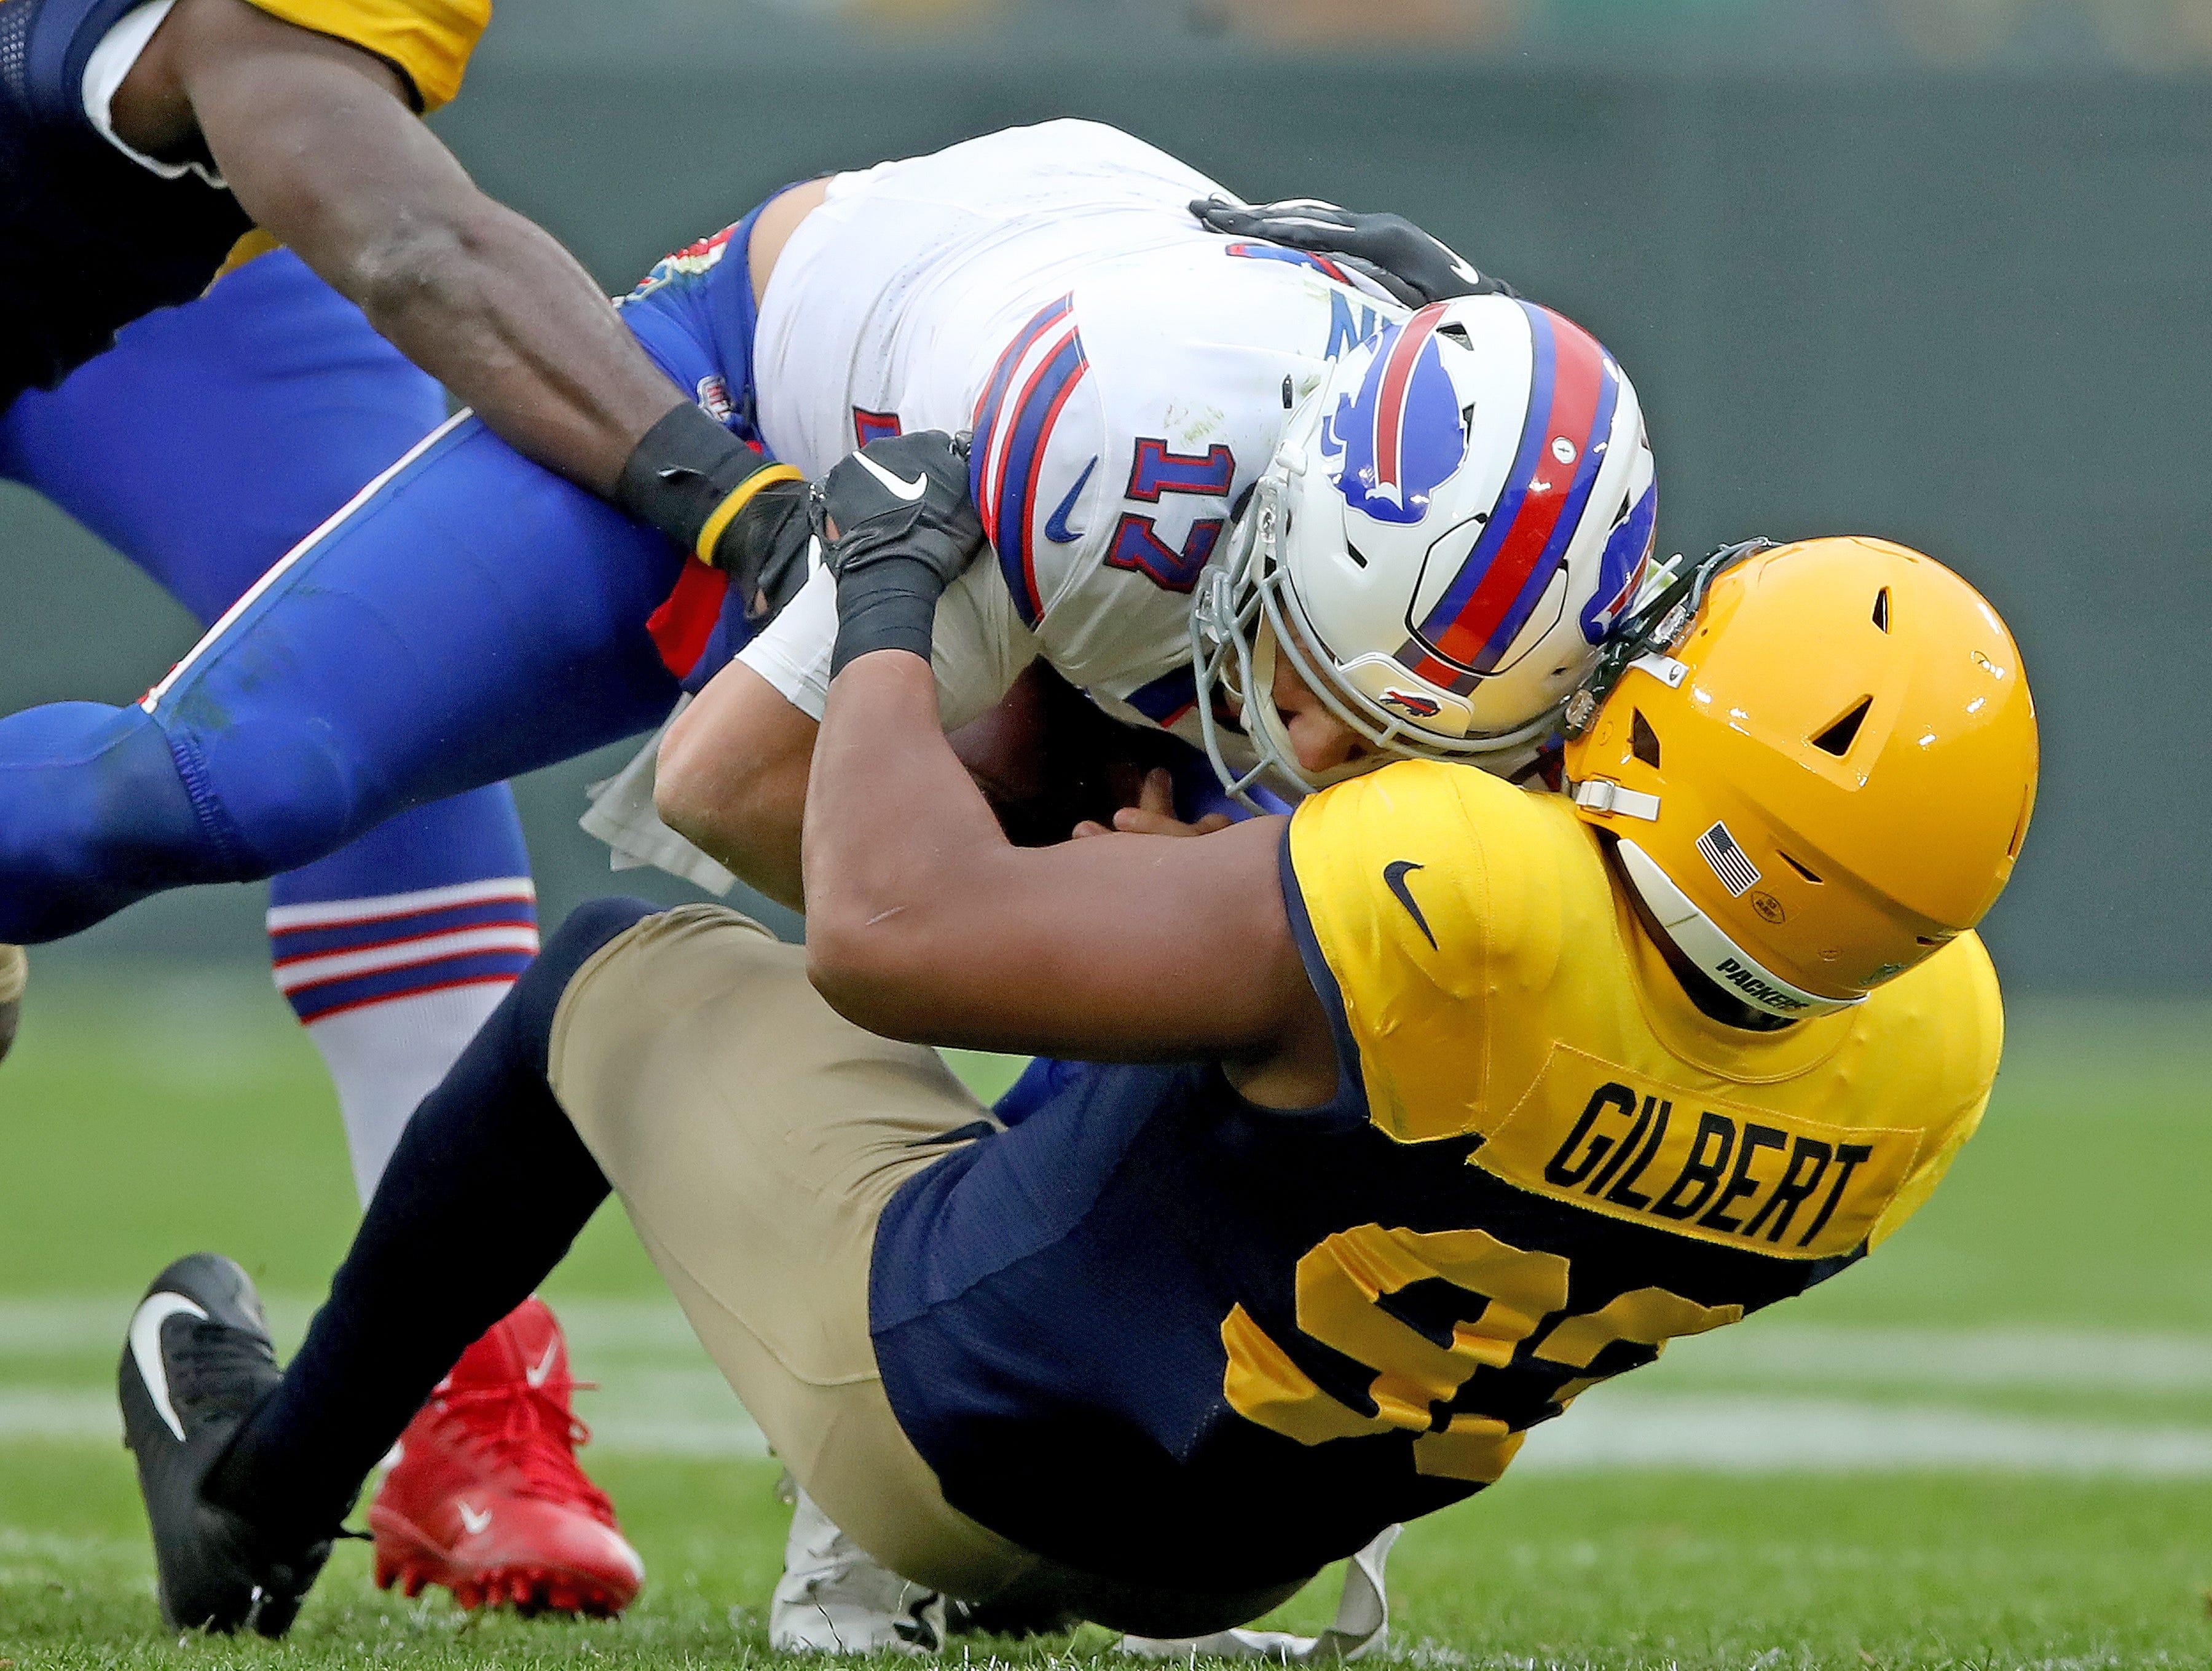 Green Bay Packers linebacker Reggie Gilbert (93) sacks quarterback Josh Allen (17) against the Buffalo Bills Sunday September 30, 2018 at Lambeau Field in Green Bay, Wis.